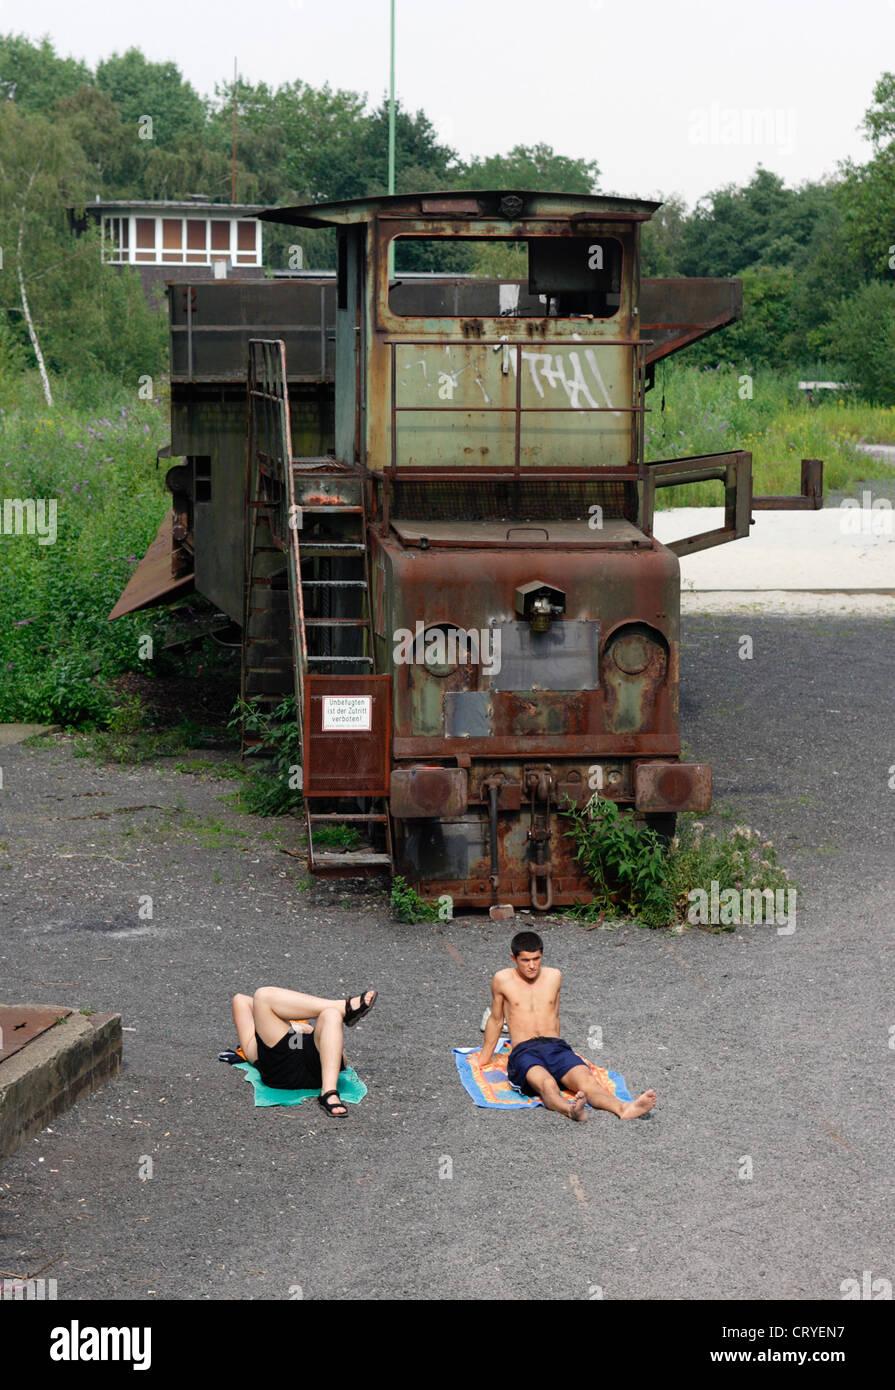 Food, teens at work pool Zollverein - Stock Image